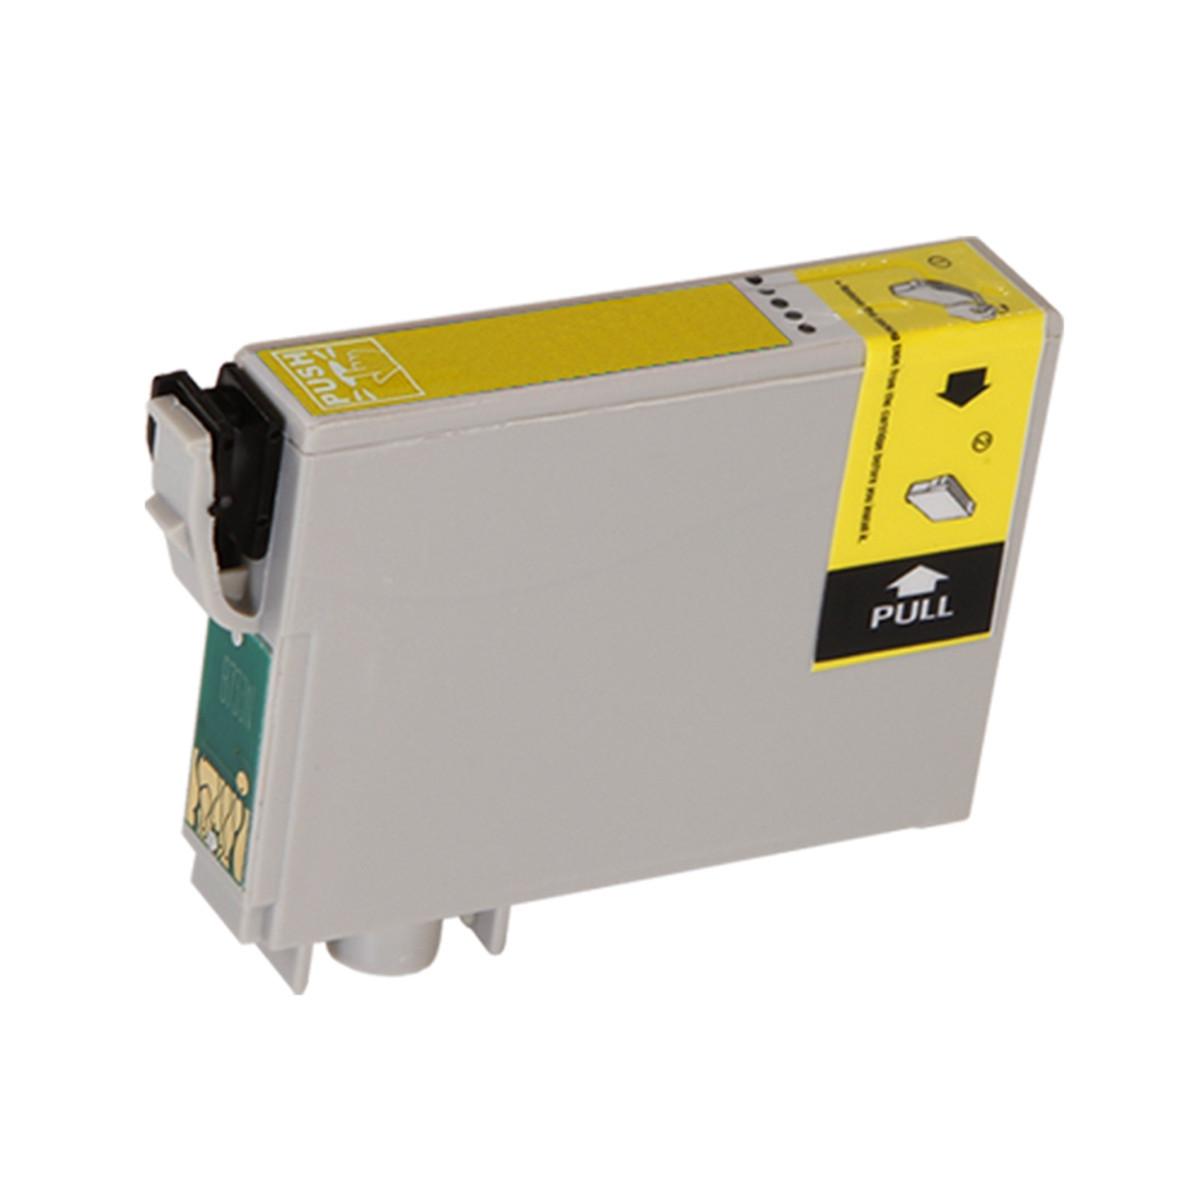 Cartucho de Tinta Compatível com Epson T082420 T082 T0824 Amarelo | RX590 R290 R390 R270 T50 | 12ml